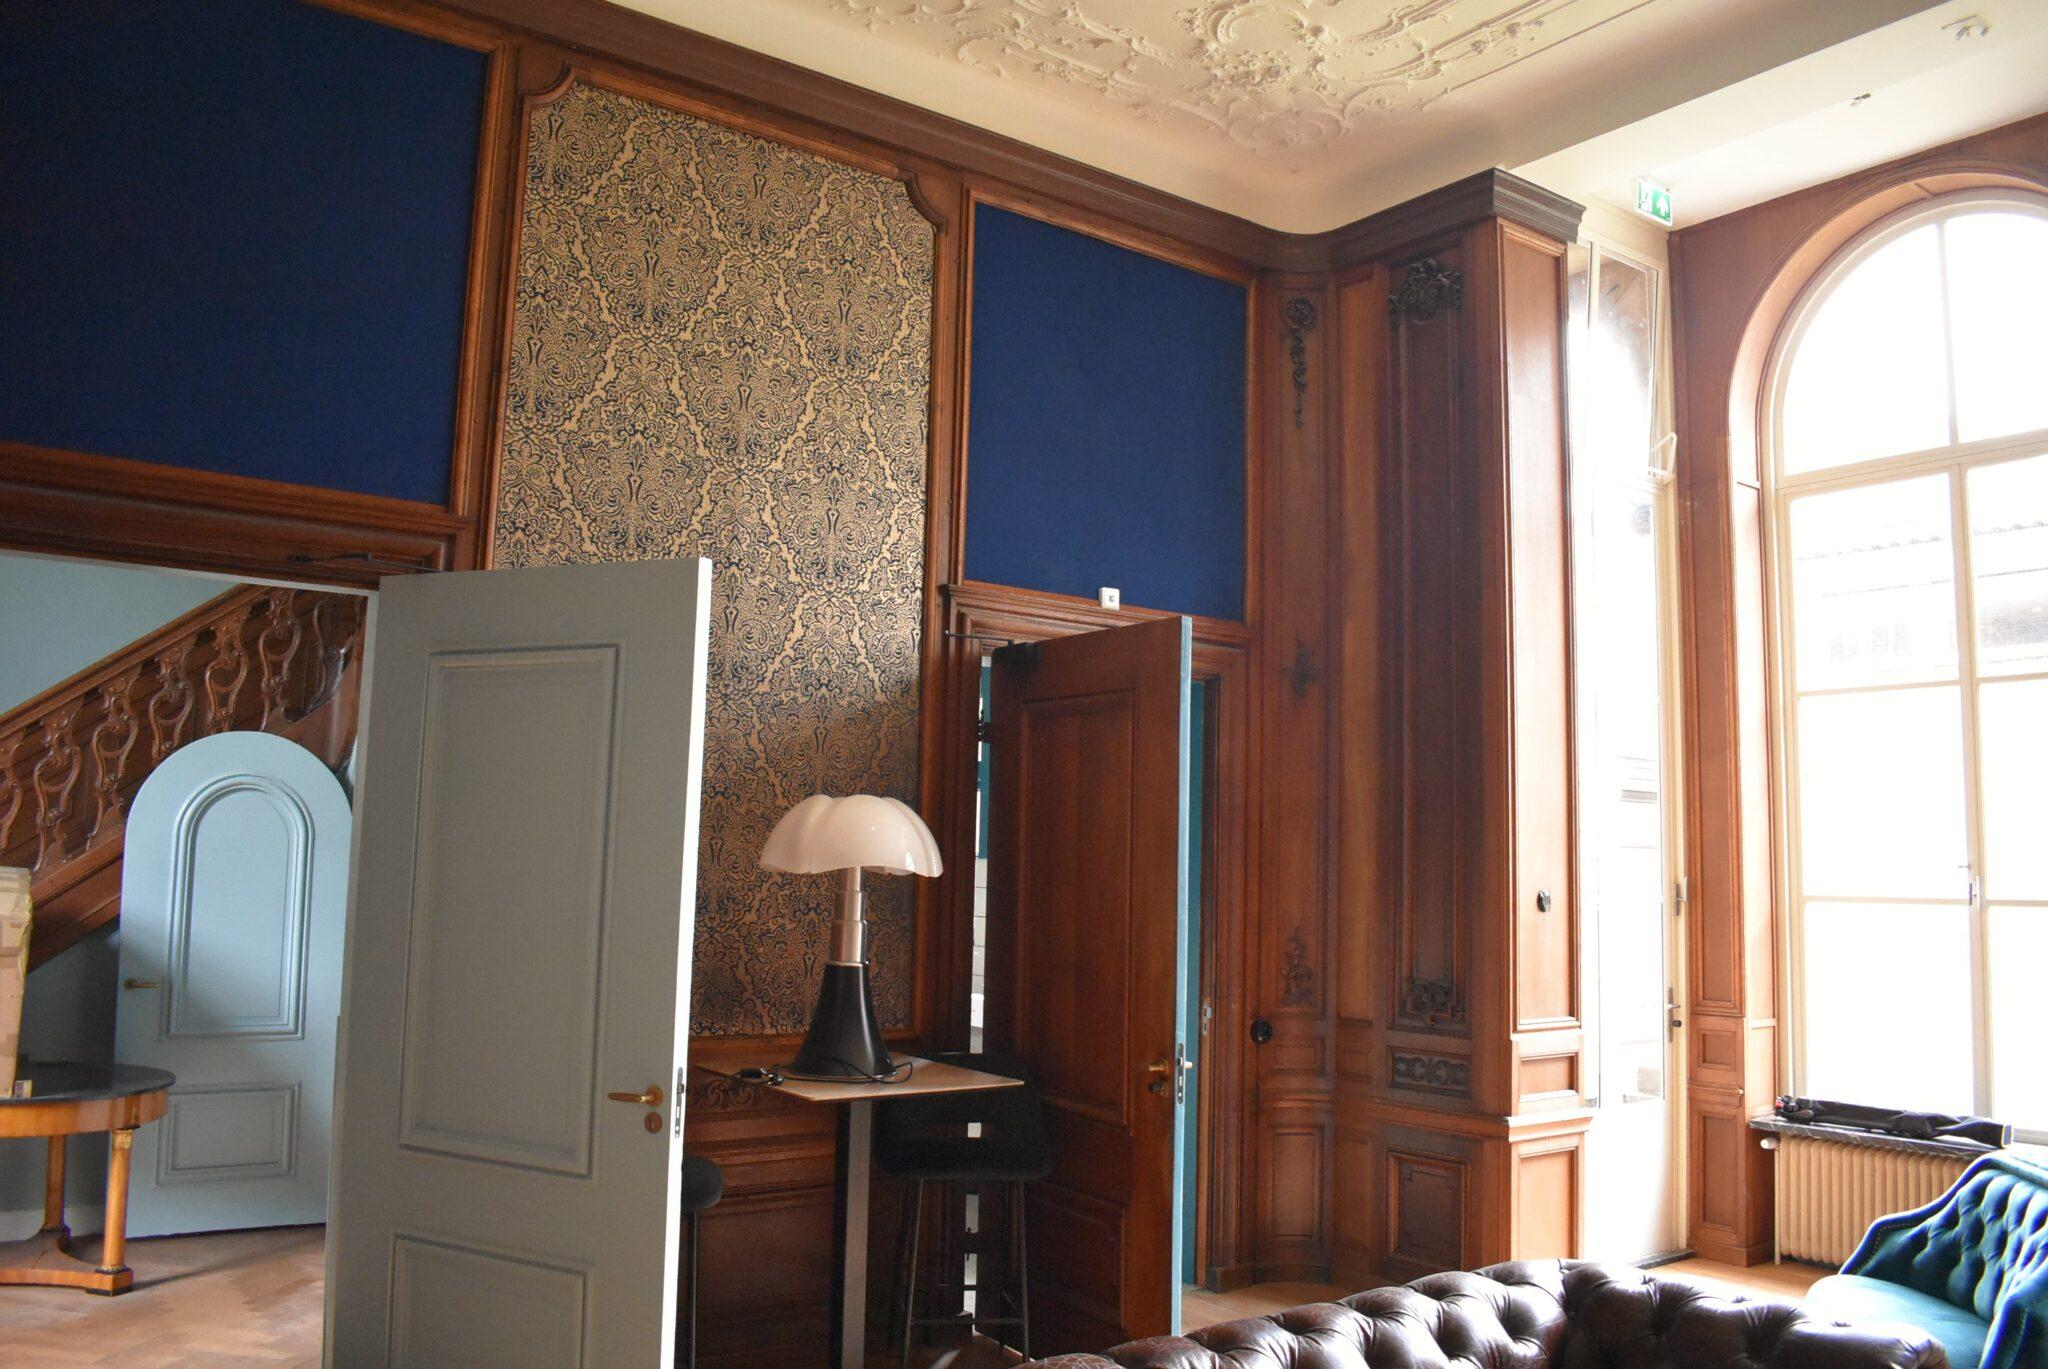 Châteauform Landhuis Mariënheuvel | foto: indebuurt Haarlem